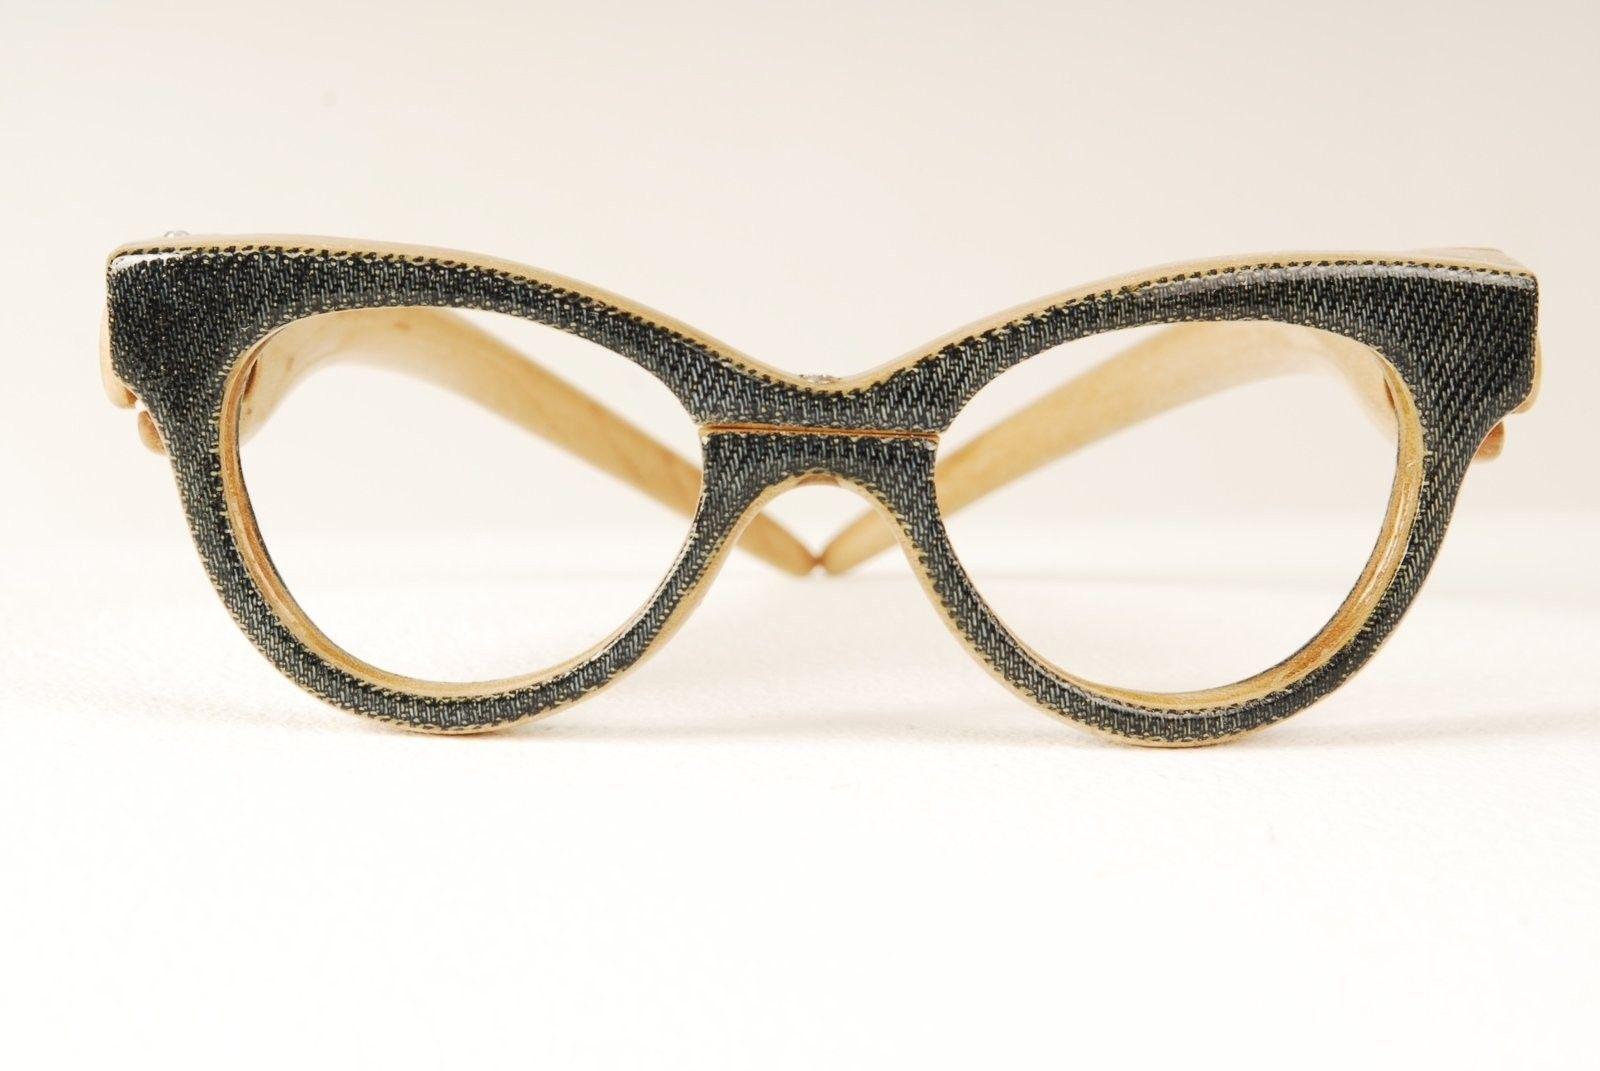 Spectacular Handmade Wooden Sunglasses - 2016-05 Jaromir Cateye 25.JPG